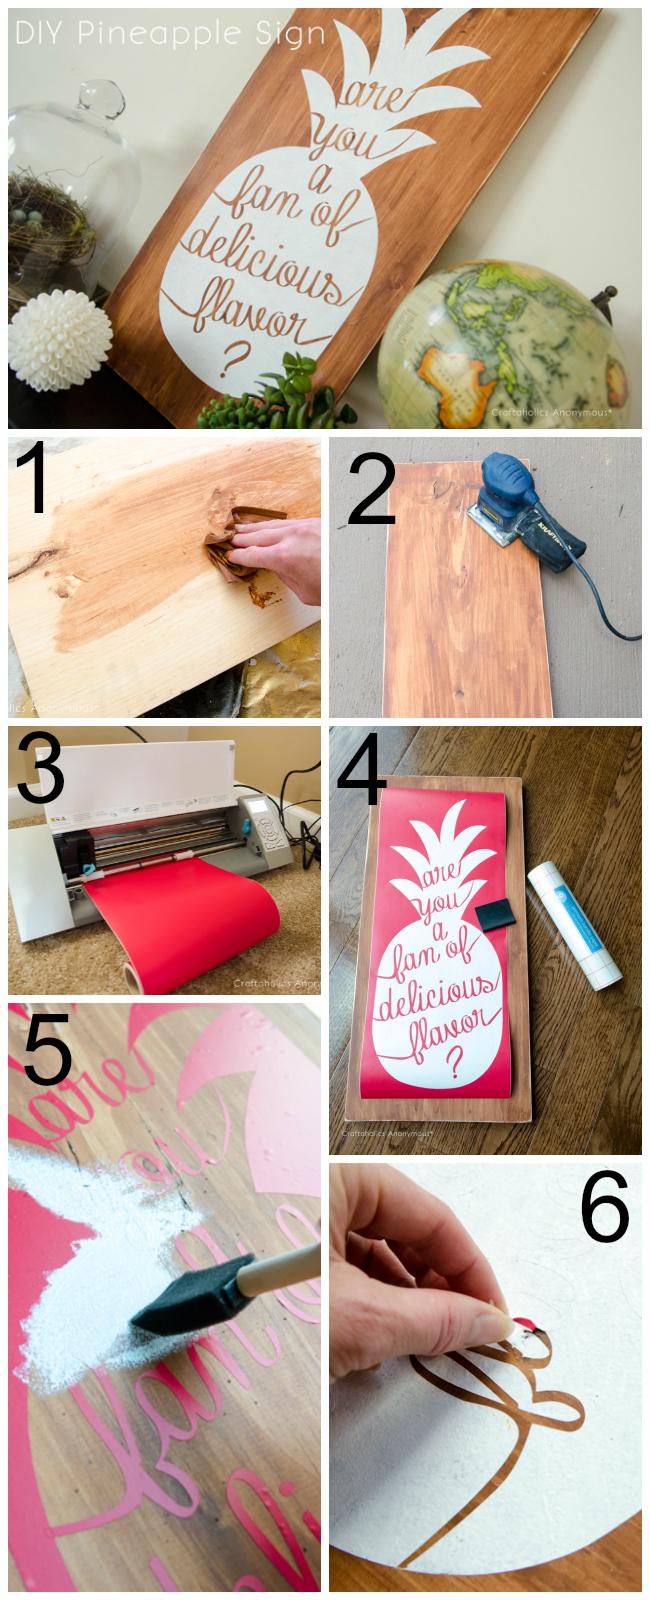 DIY Wood Pineapple Sign tutorial